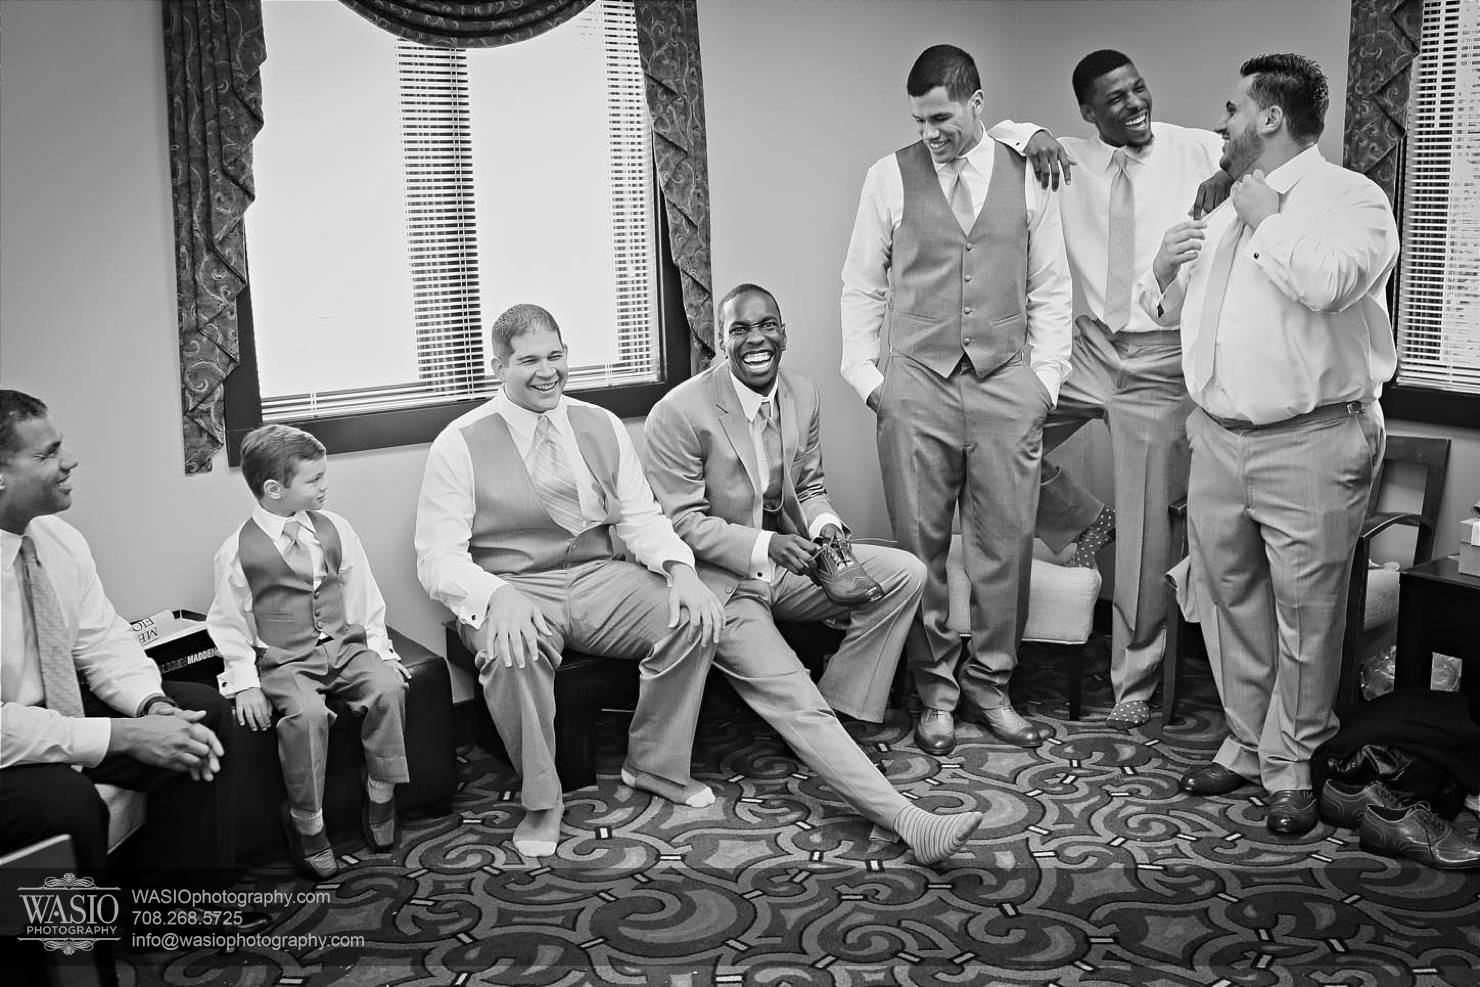 wheeling-wedding-groomsmen-preparation Chevy Chase Country Club Wedding - Elizabeth & Michael